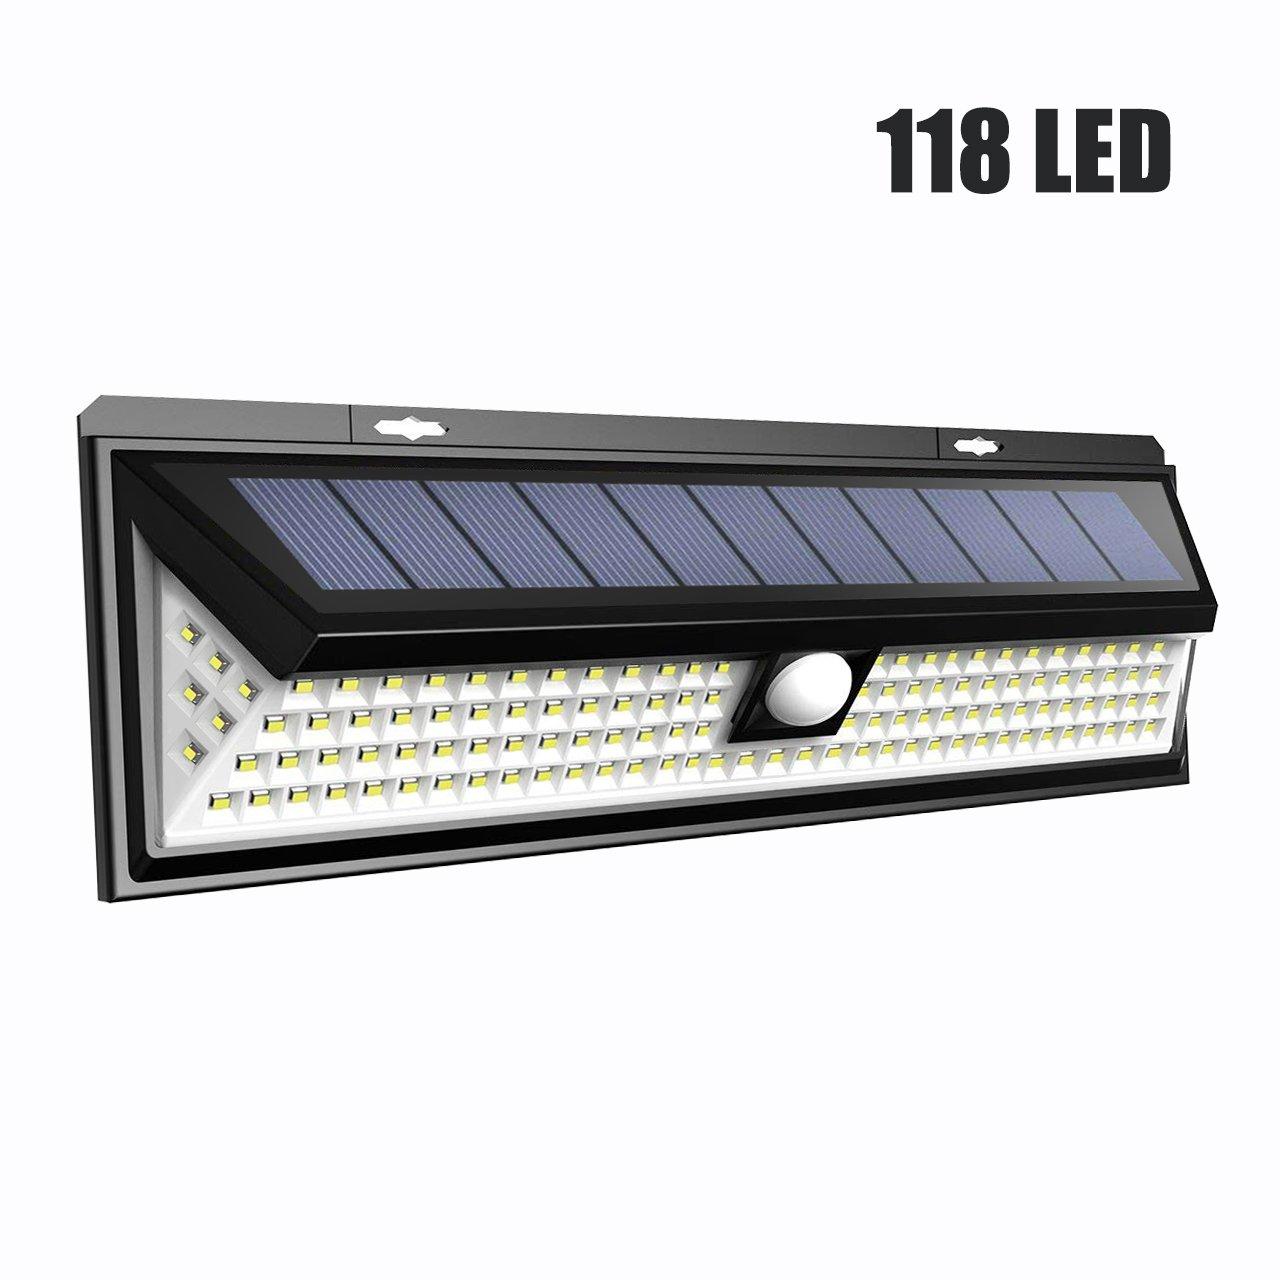 LTPAG Foco Solar LED Exterior, 3 Modos Foco Solar 118 LED Jardin Exterior con Sensor Movimiento IP65 Impermeable Luz Solares LED para Jardín, Terraza, ...